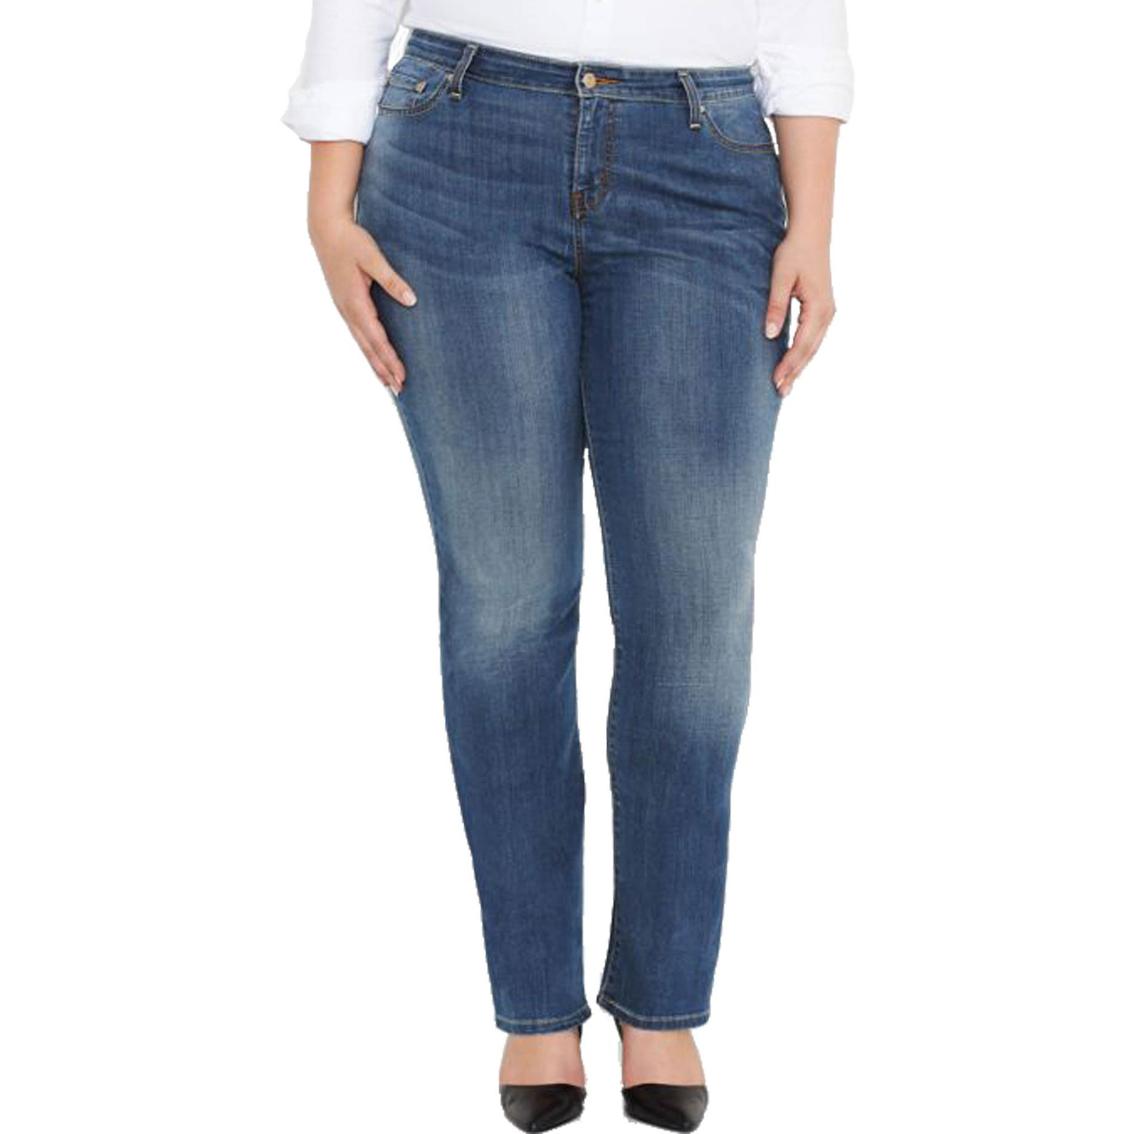 f463d76176757 Levi s 580 Plus Size Curvy Straight Jeans